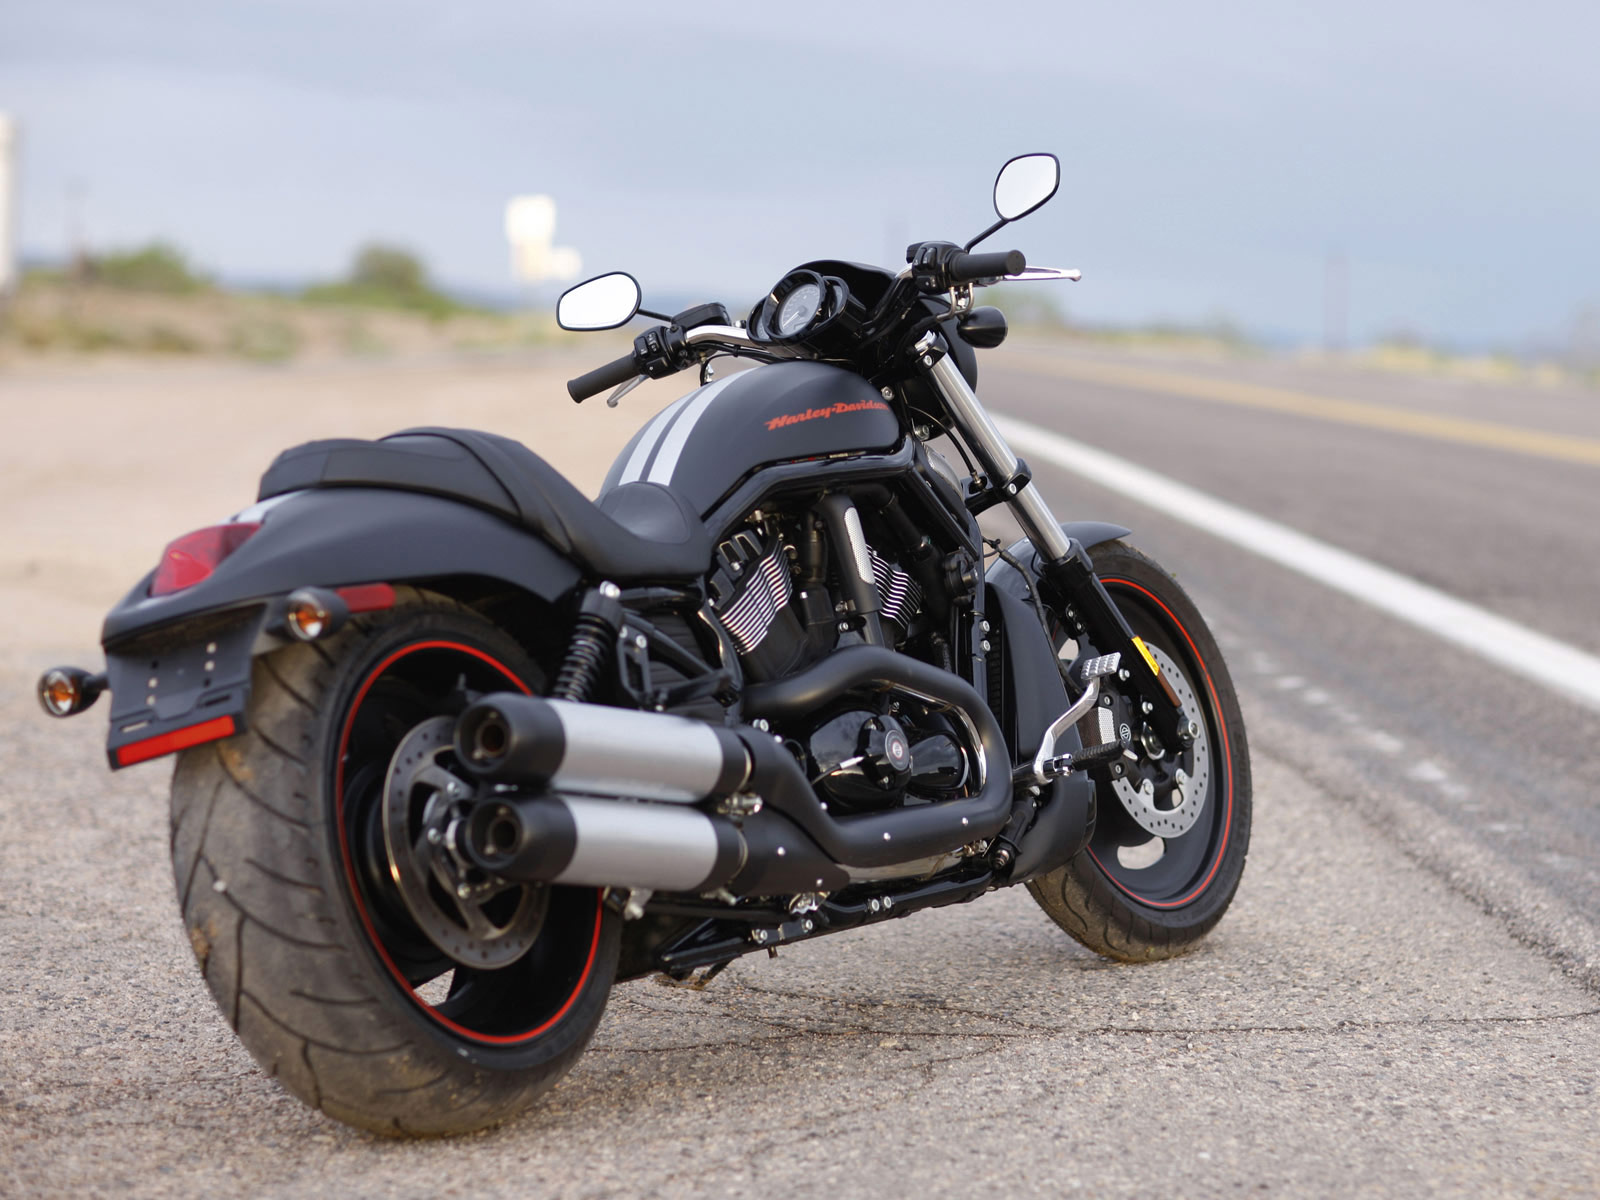 http://2.bp.blogspot.com/-Uj0753XhkH0/UdspIH_n3oI/AAAAAAAACR4/FxkpkMmtVlo/s1600/Harley-devidson-sport-bike-high-definition-wallpaper.jpg Cool